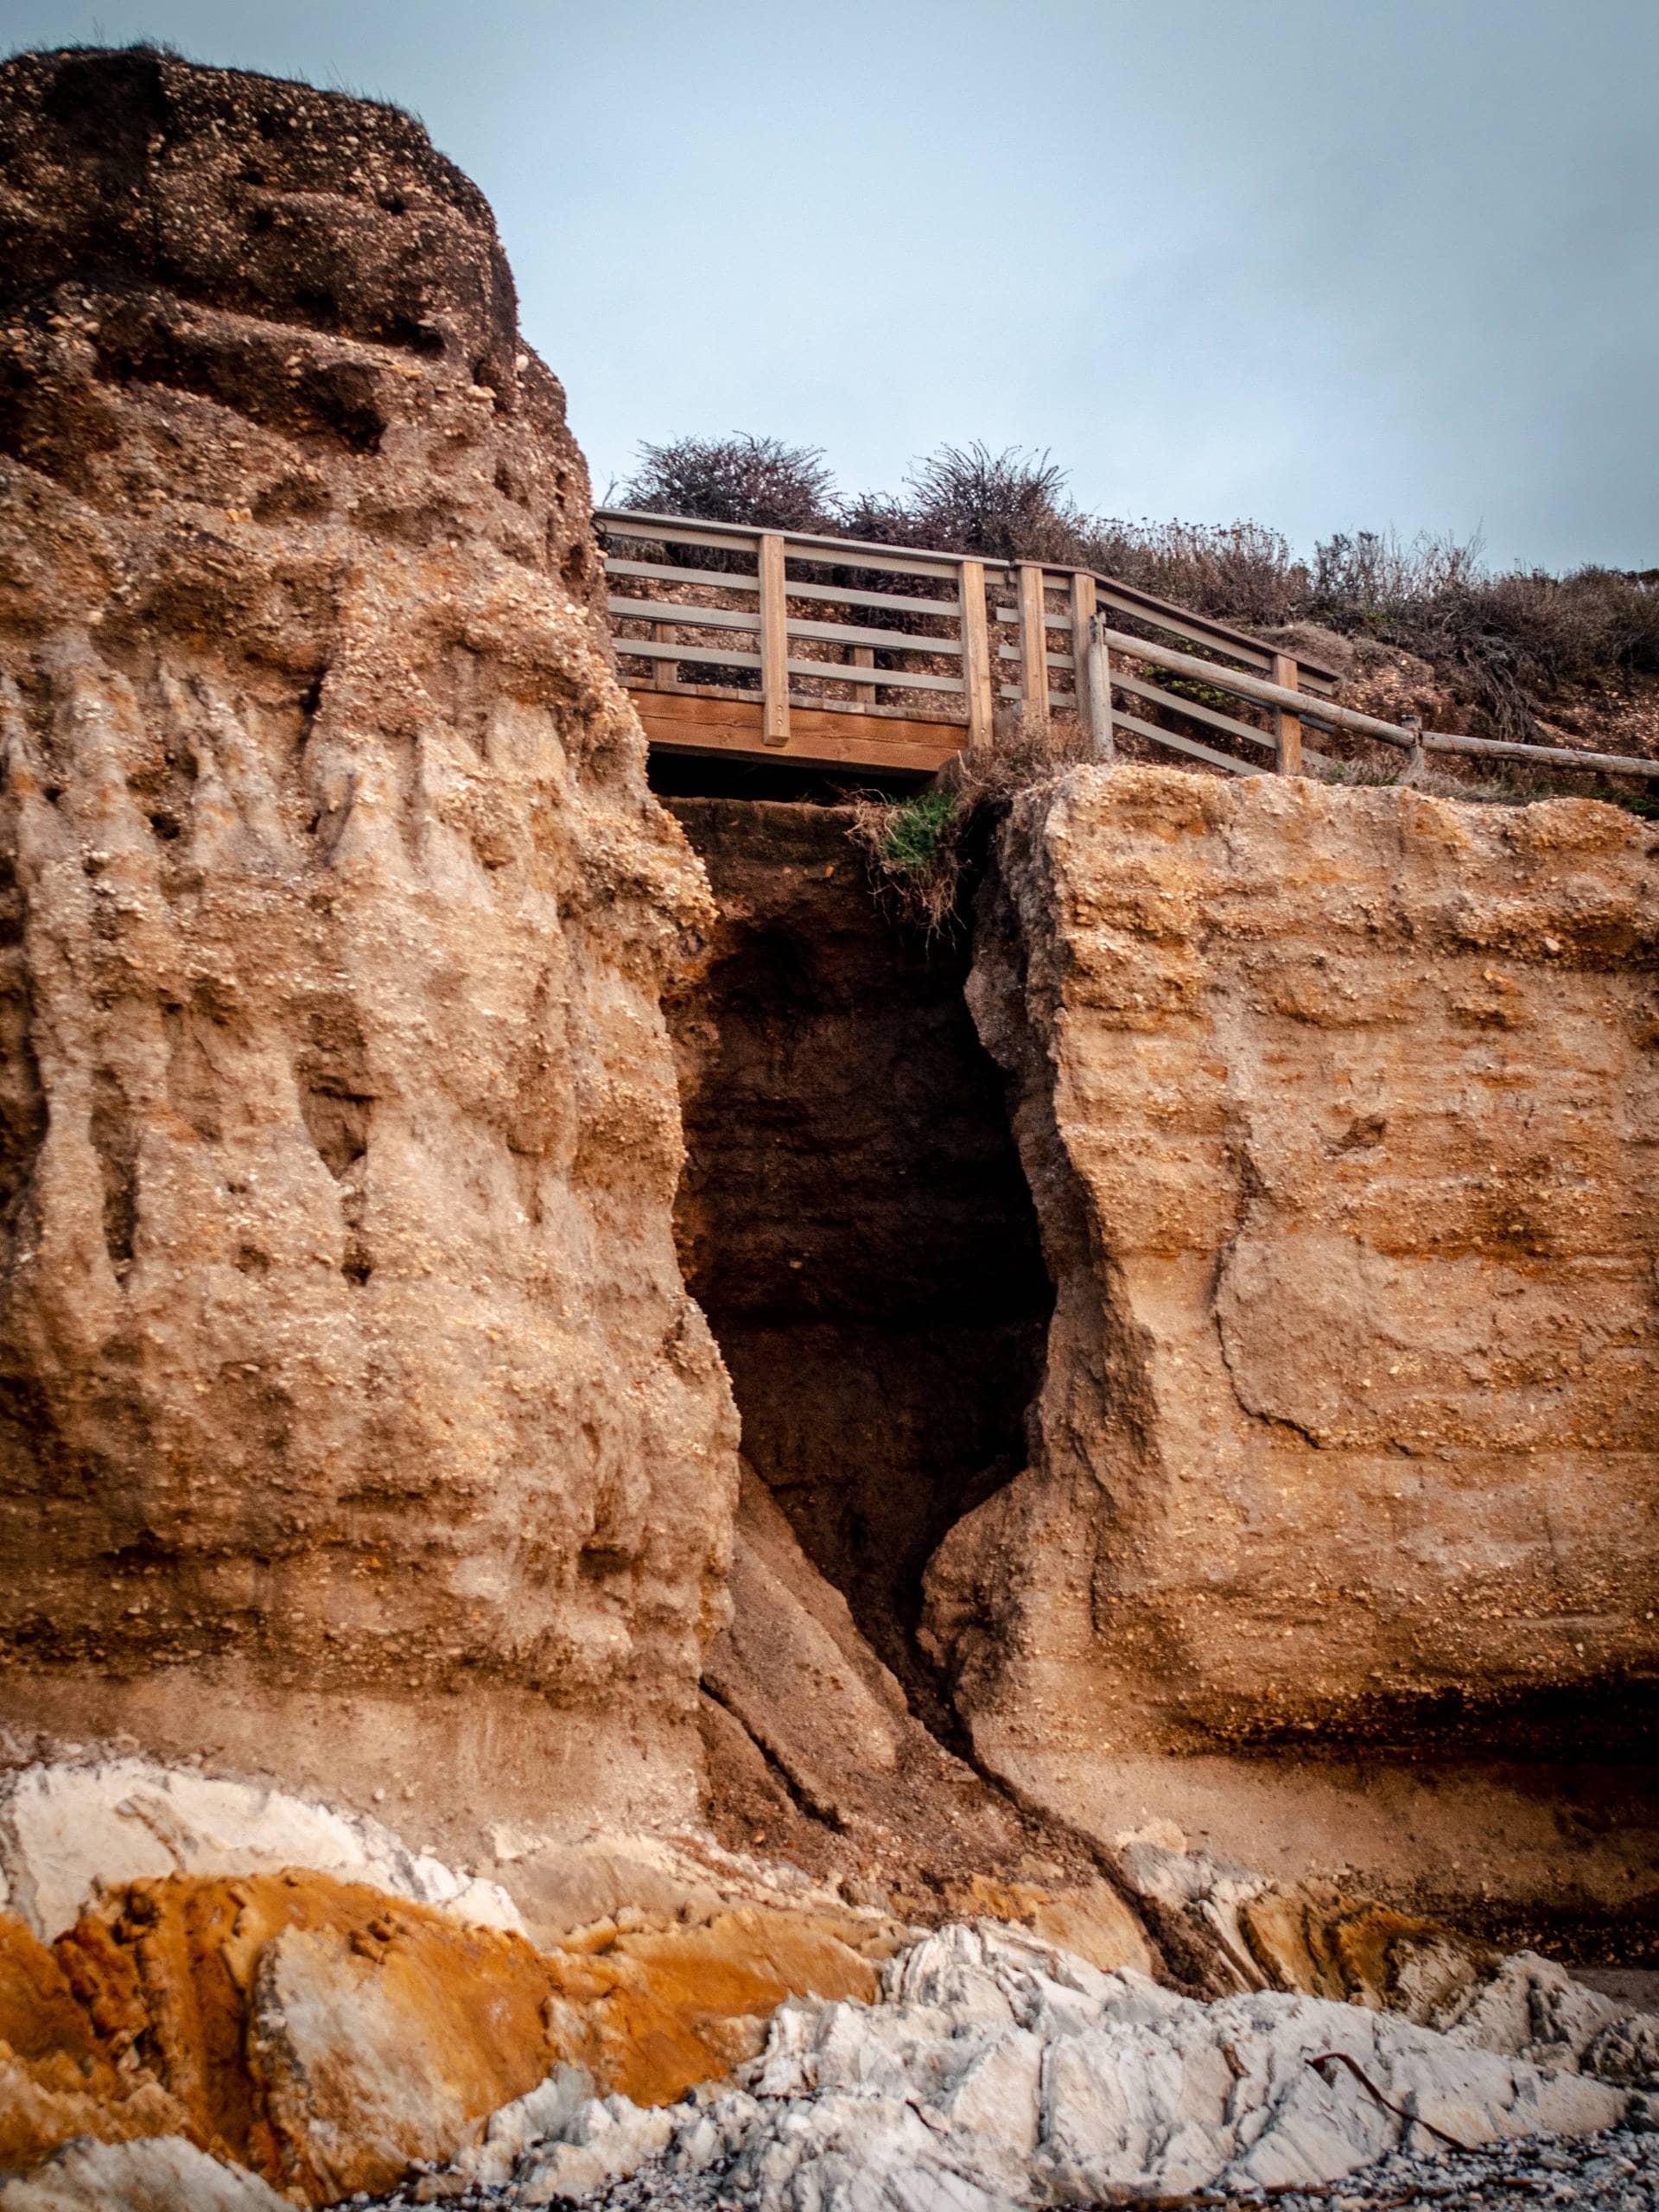 Bridge over rocks